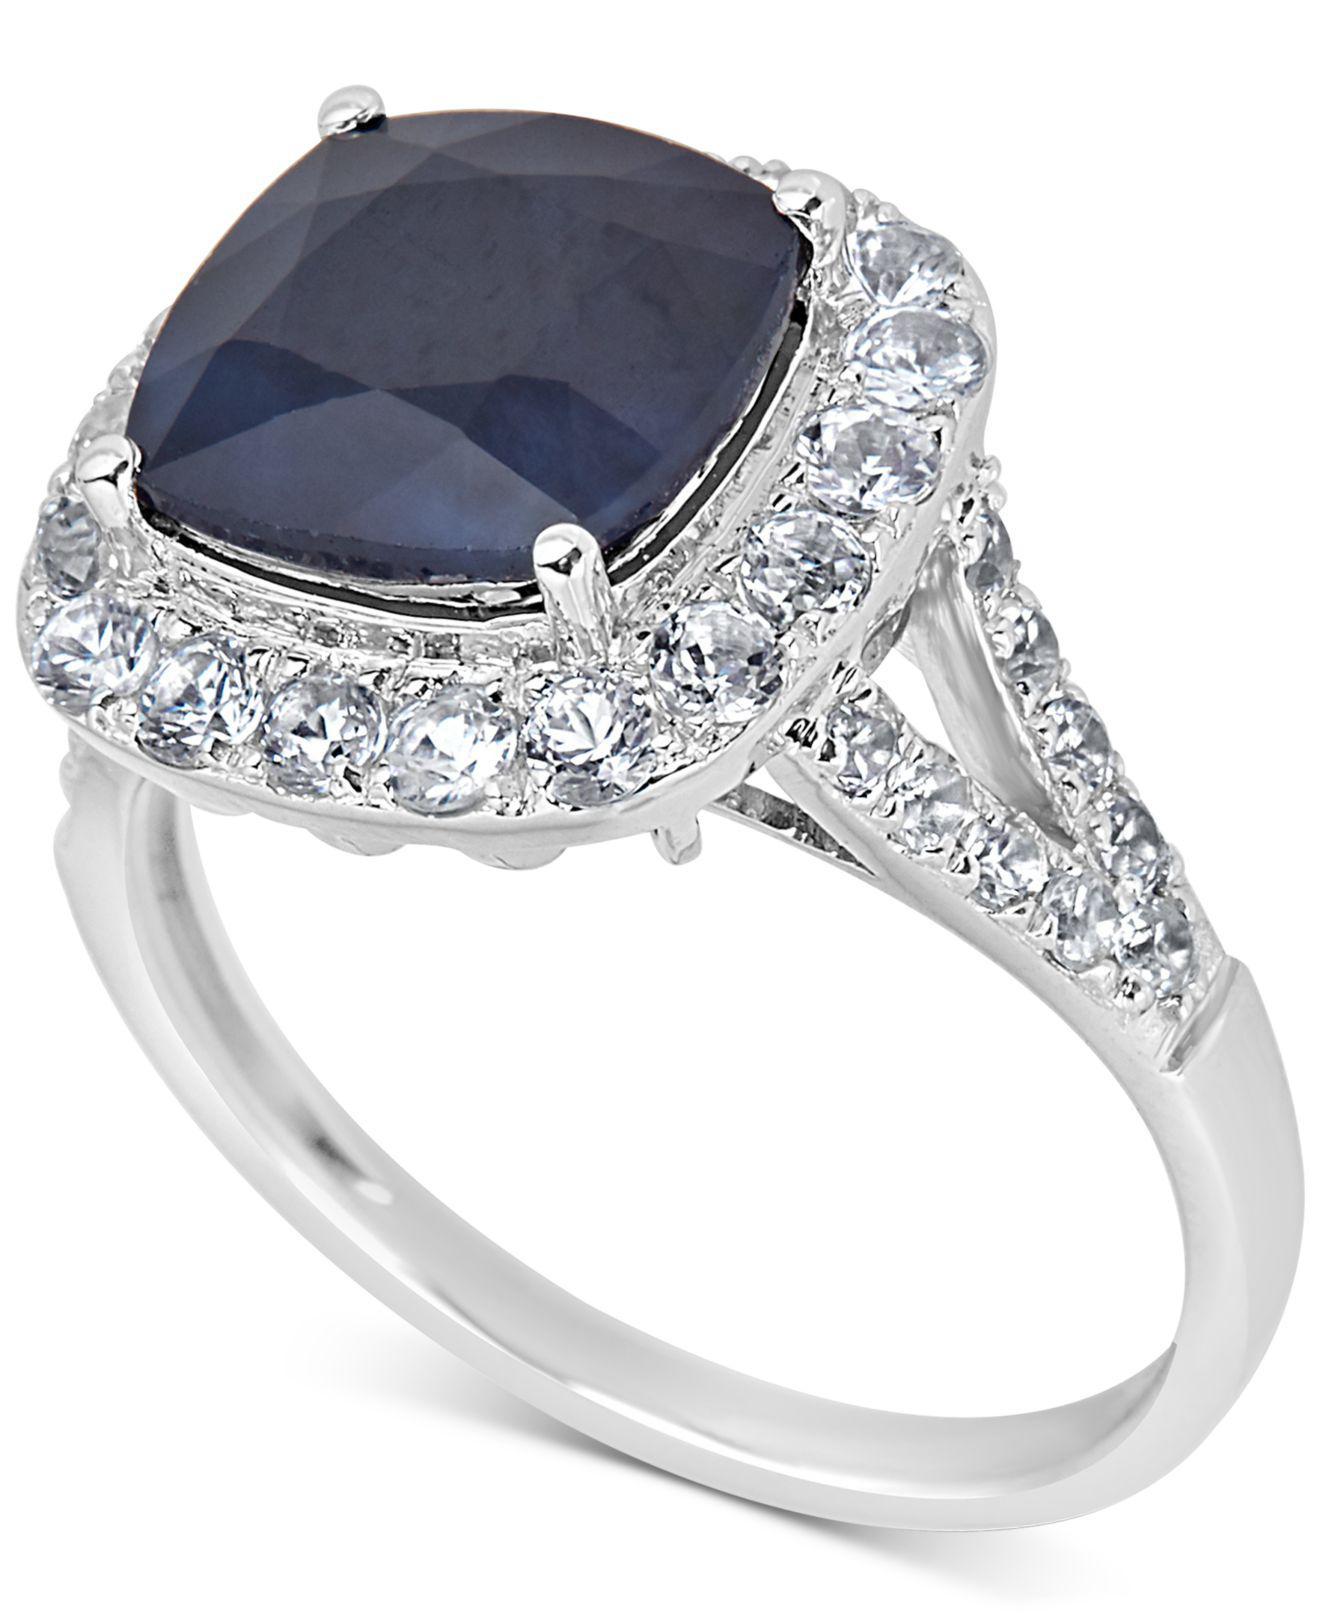 ec0fb0a31 Lyst - Macy's Sapphire (3 Ct. T.w.) & White Sapphire (1/3 Ct. T.w. ...